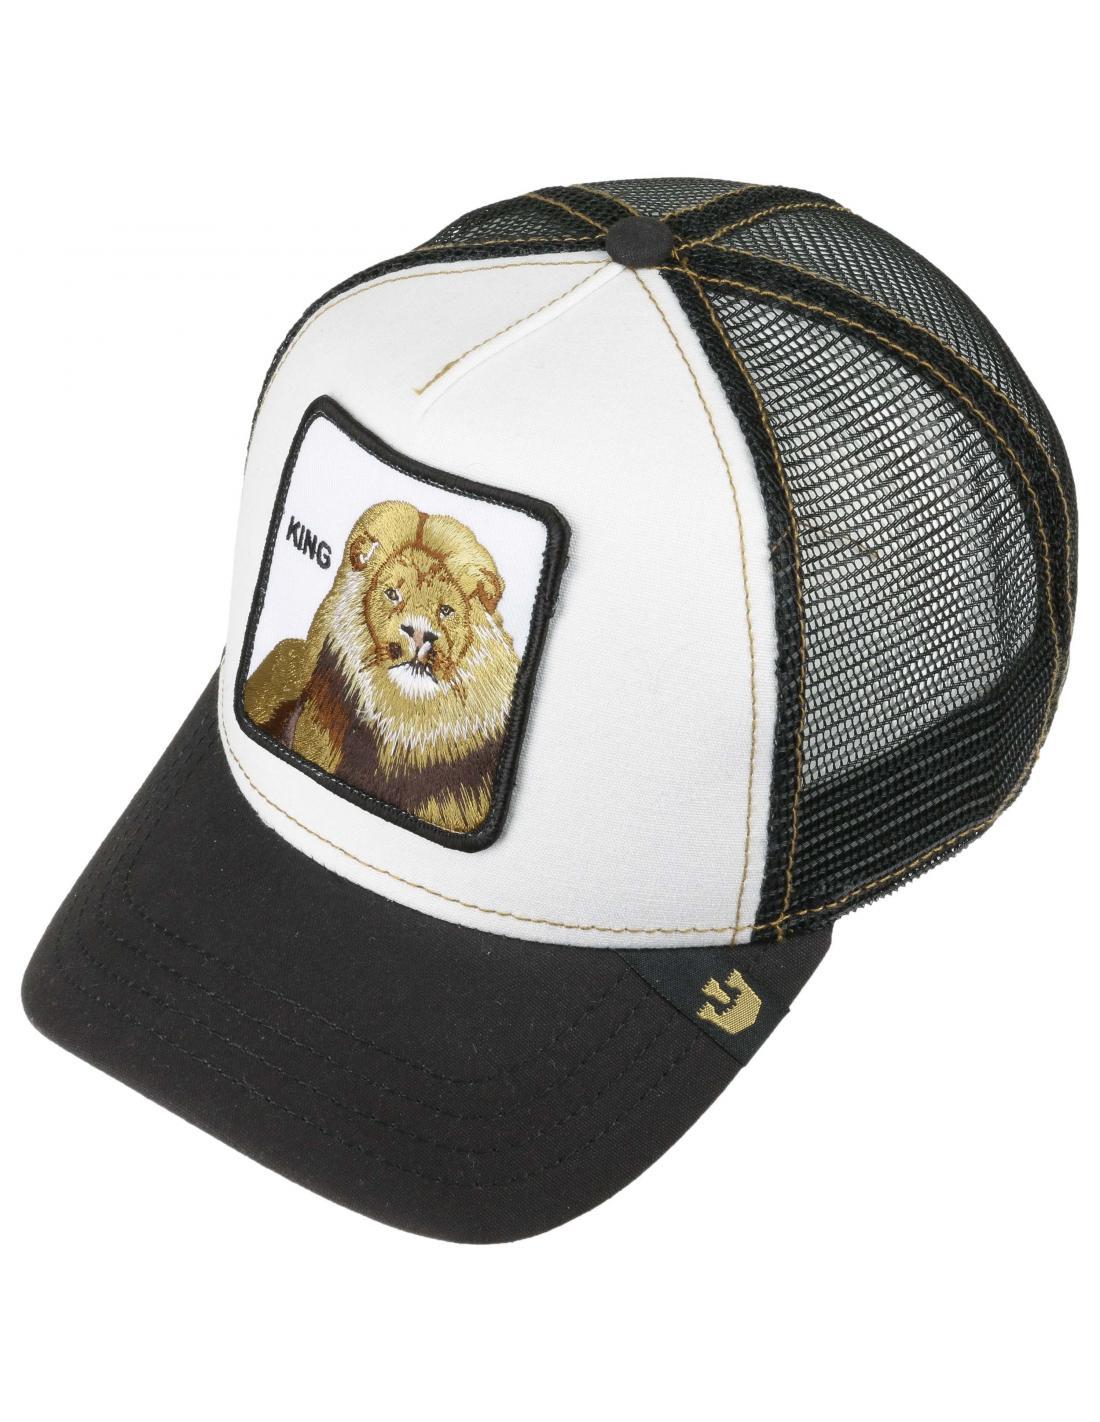 9a40d755dfcd27 Goorin Bros Pig Cof Animal Farm Trucker Hat. Next